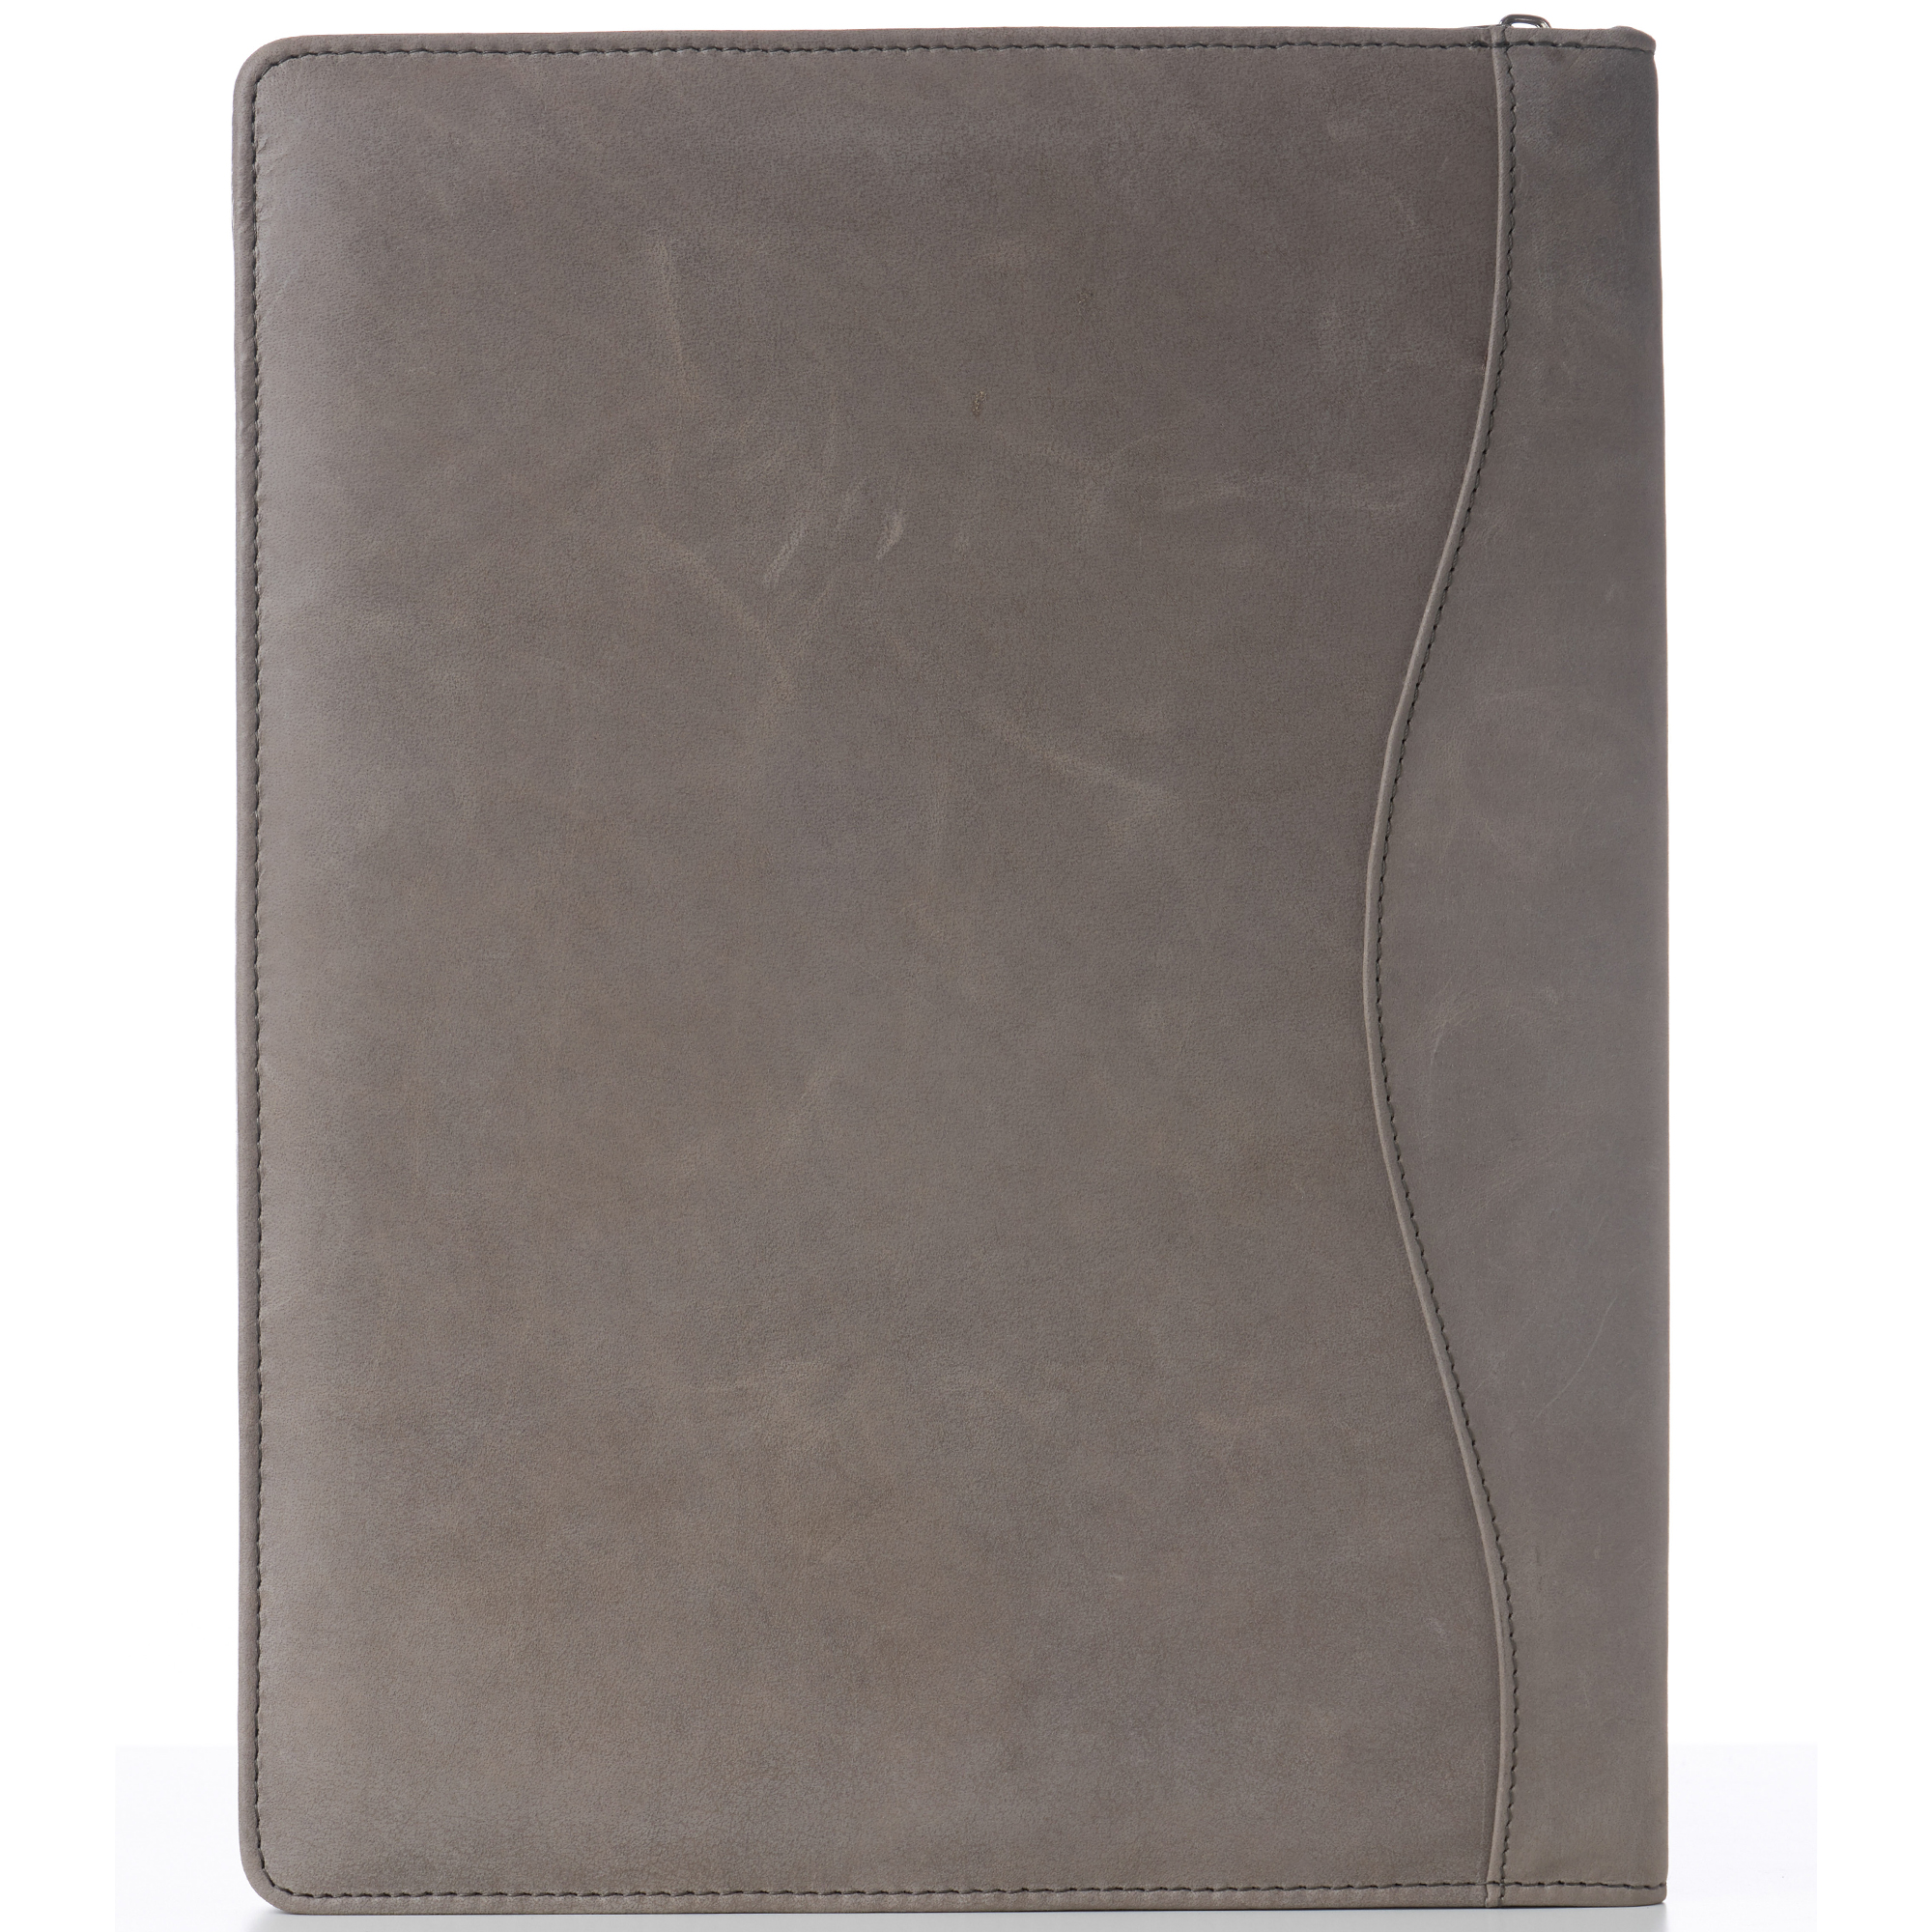 thumbnail 39 - Alpine Swiss Leather Zippered Writing Pad Portfolio Business Briefcase Organizer